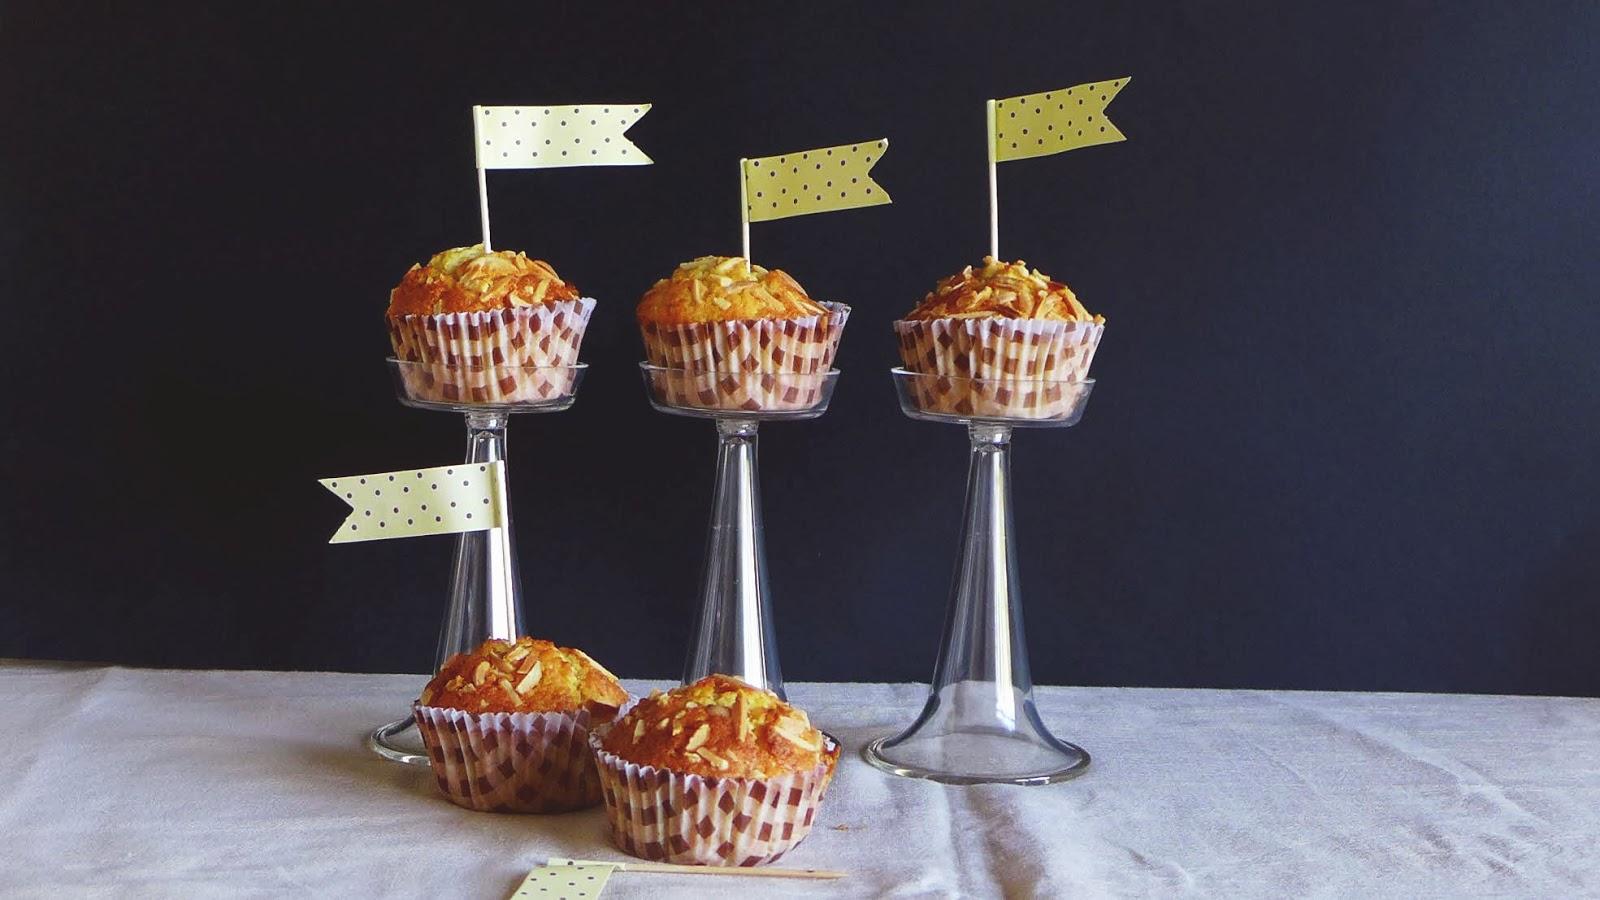 : Muffins de laranja e amêndoa/ orange and almond muffins #9D6D2E